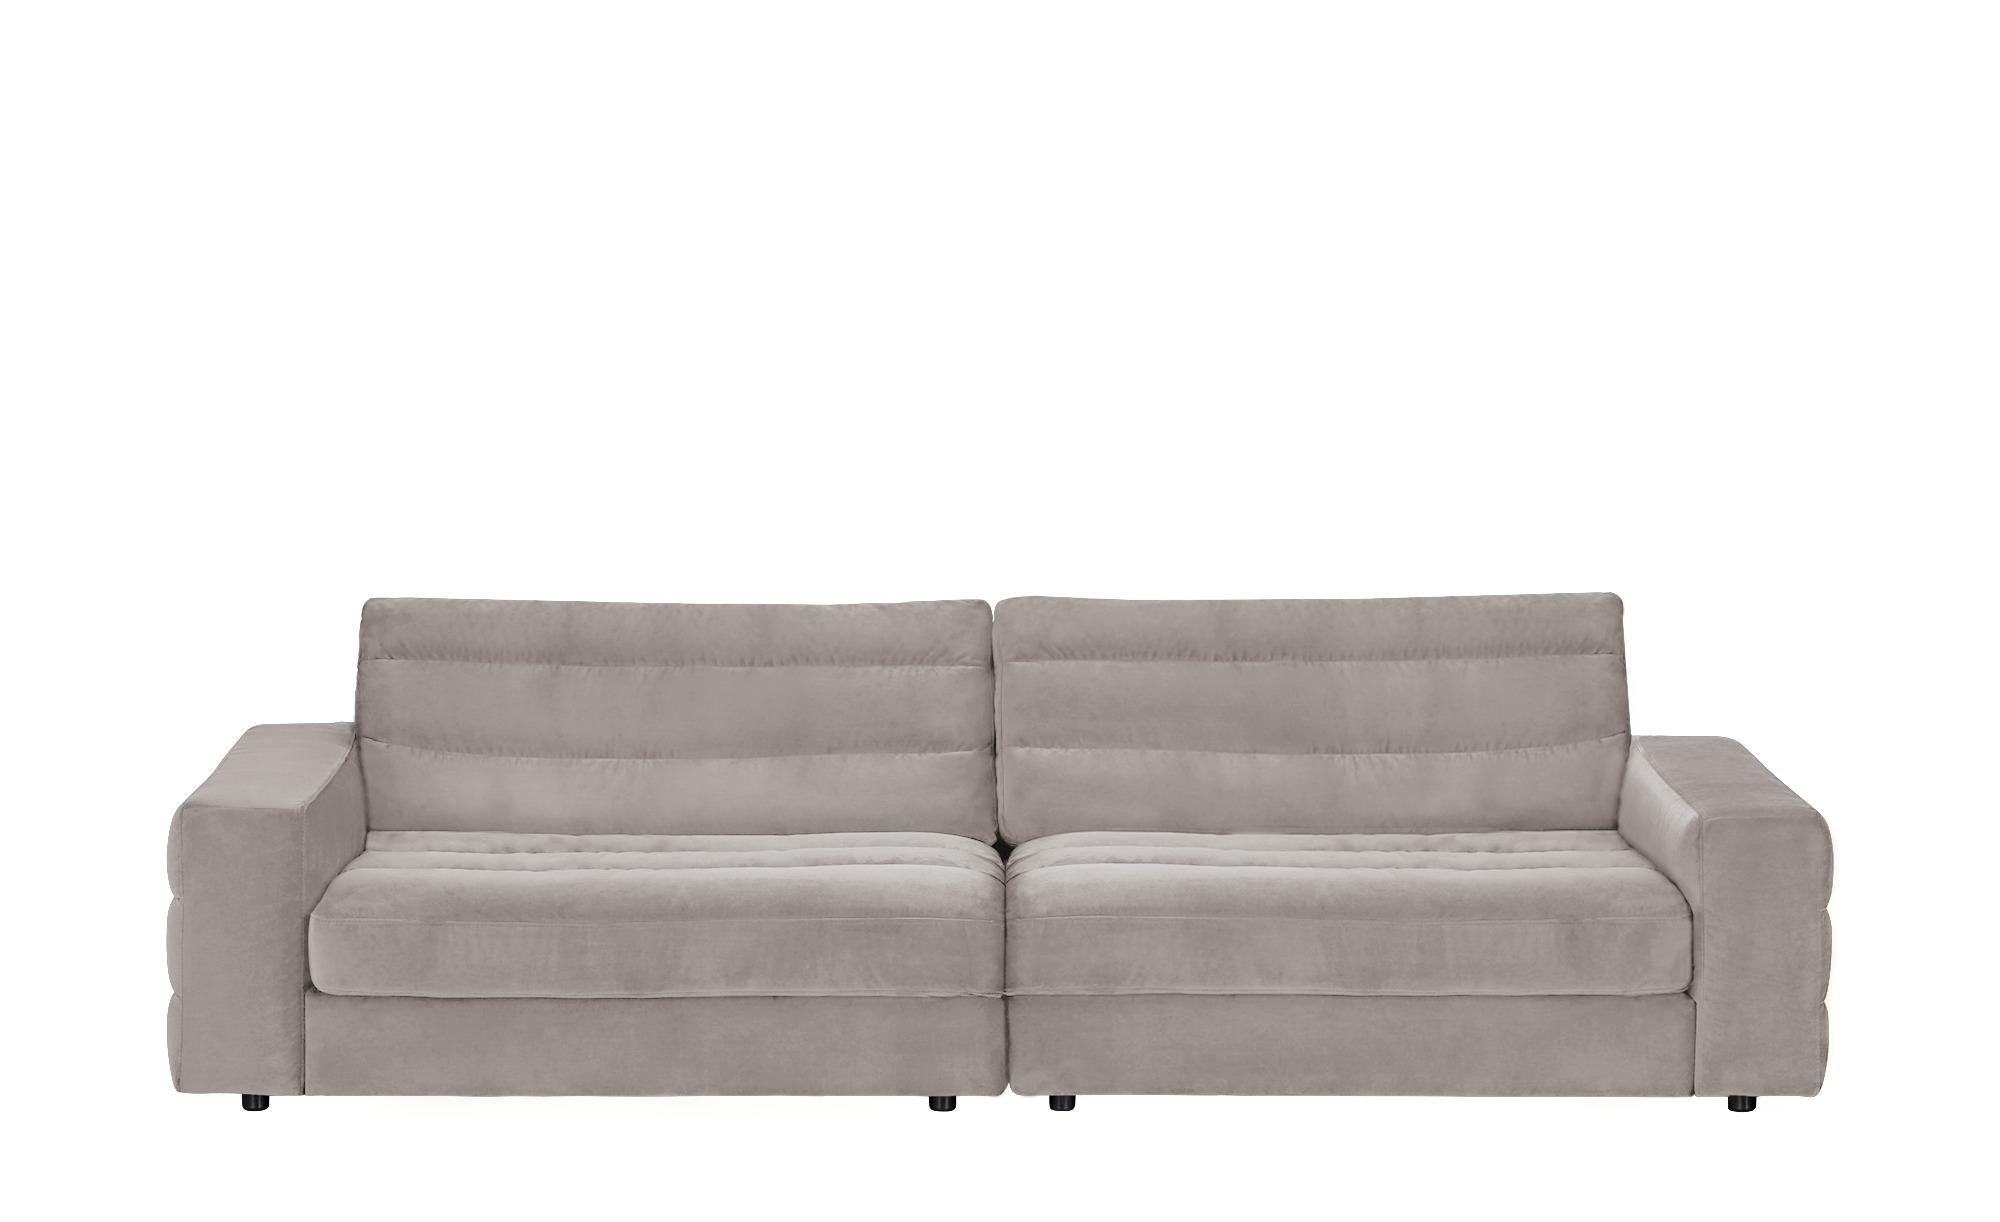 pop Big Sofa  Scarlatti ¦ beige ¦ Maße (cm): B: 296 H: 83 T: 125 Polstermöbel > Sofas > Big-Sofas - Höffner